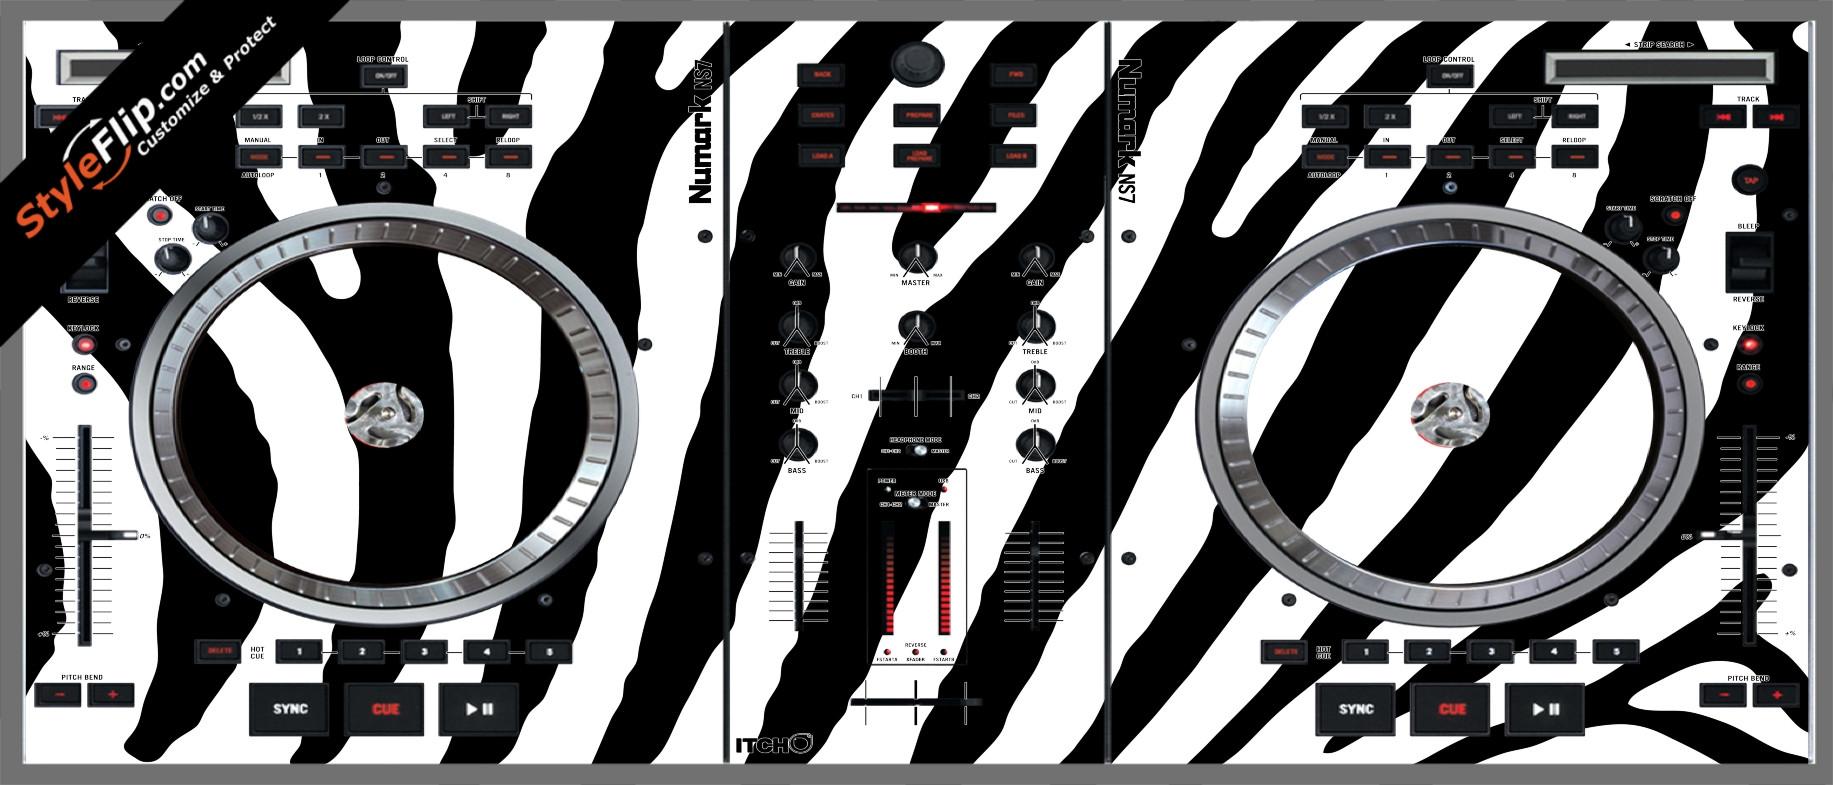 Zebra Print Numark NS-7